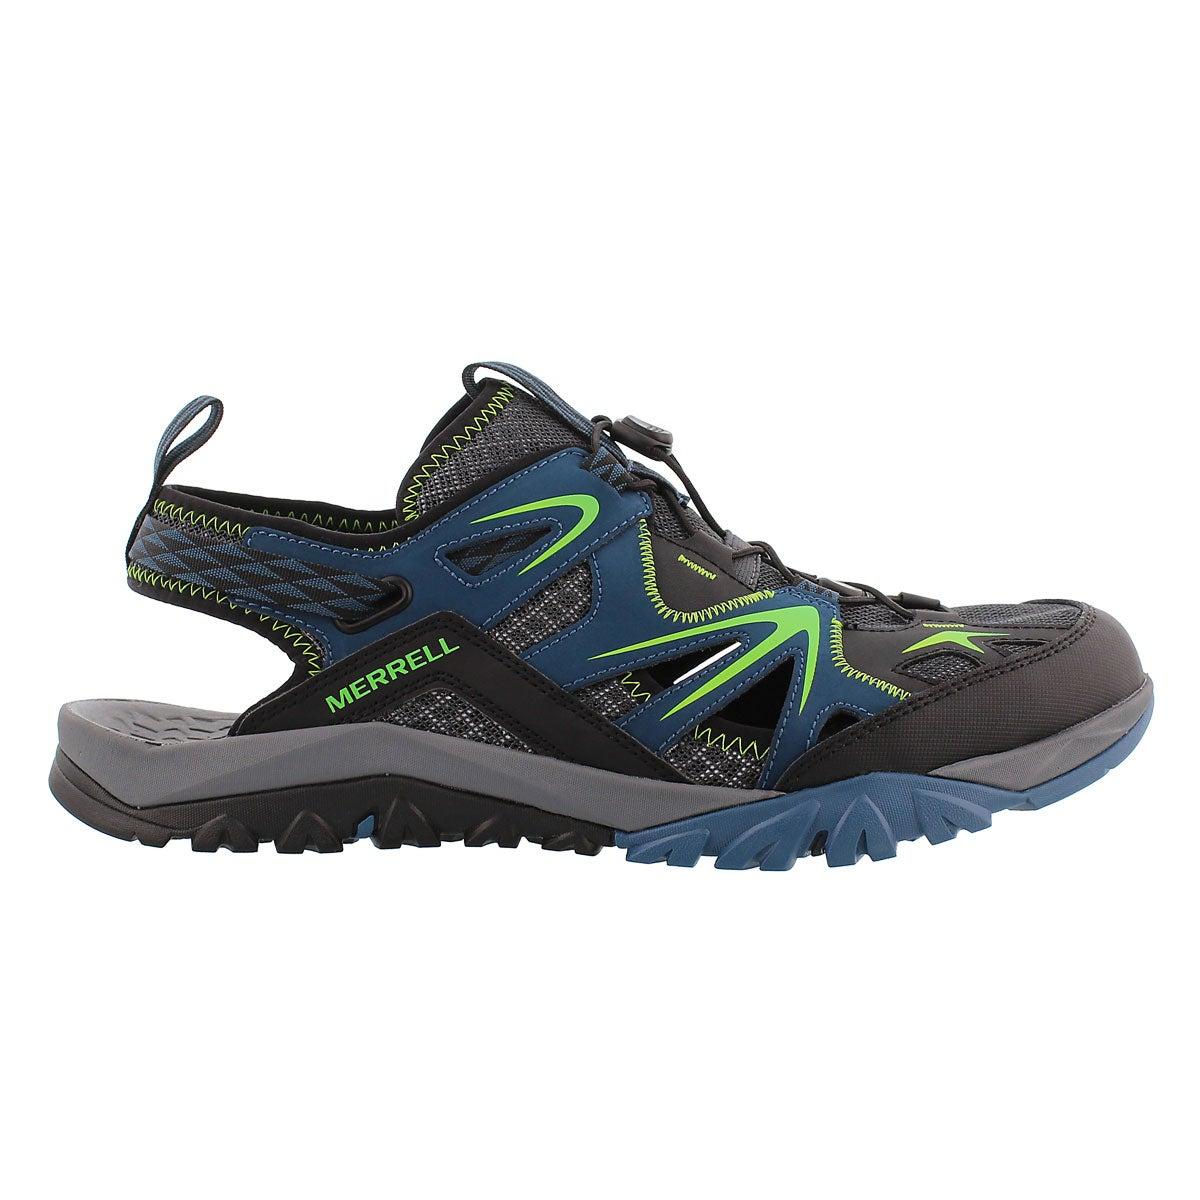 Mns Capra Rapid bright blue sieve sandal